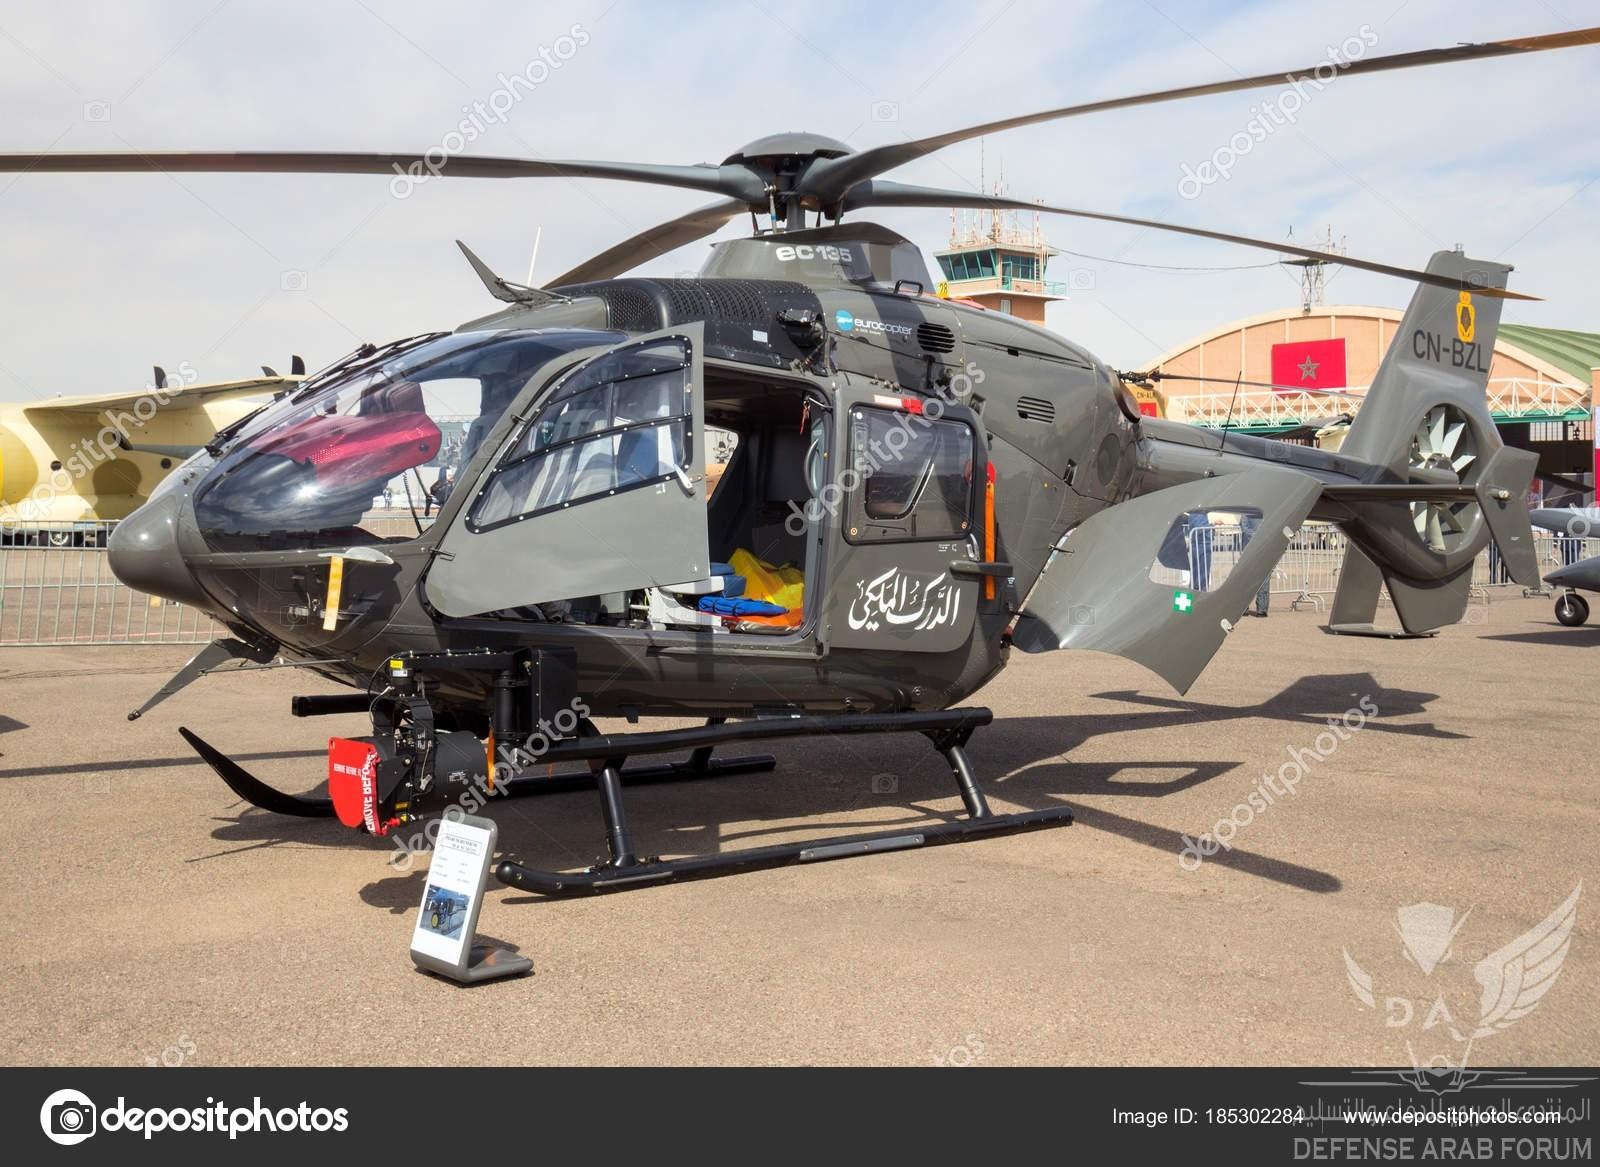 depositphotos_185302284-stock-photo-morocco-gendarmerie-eurocopter-ec-135.jpg